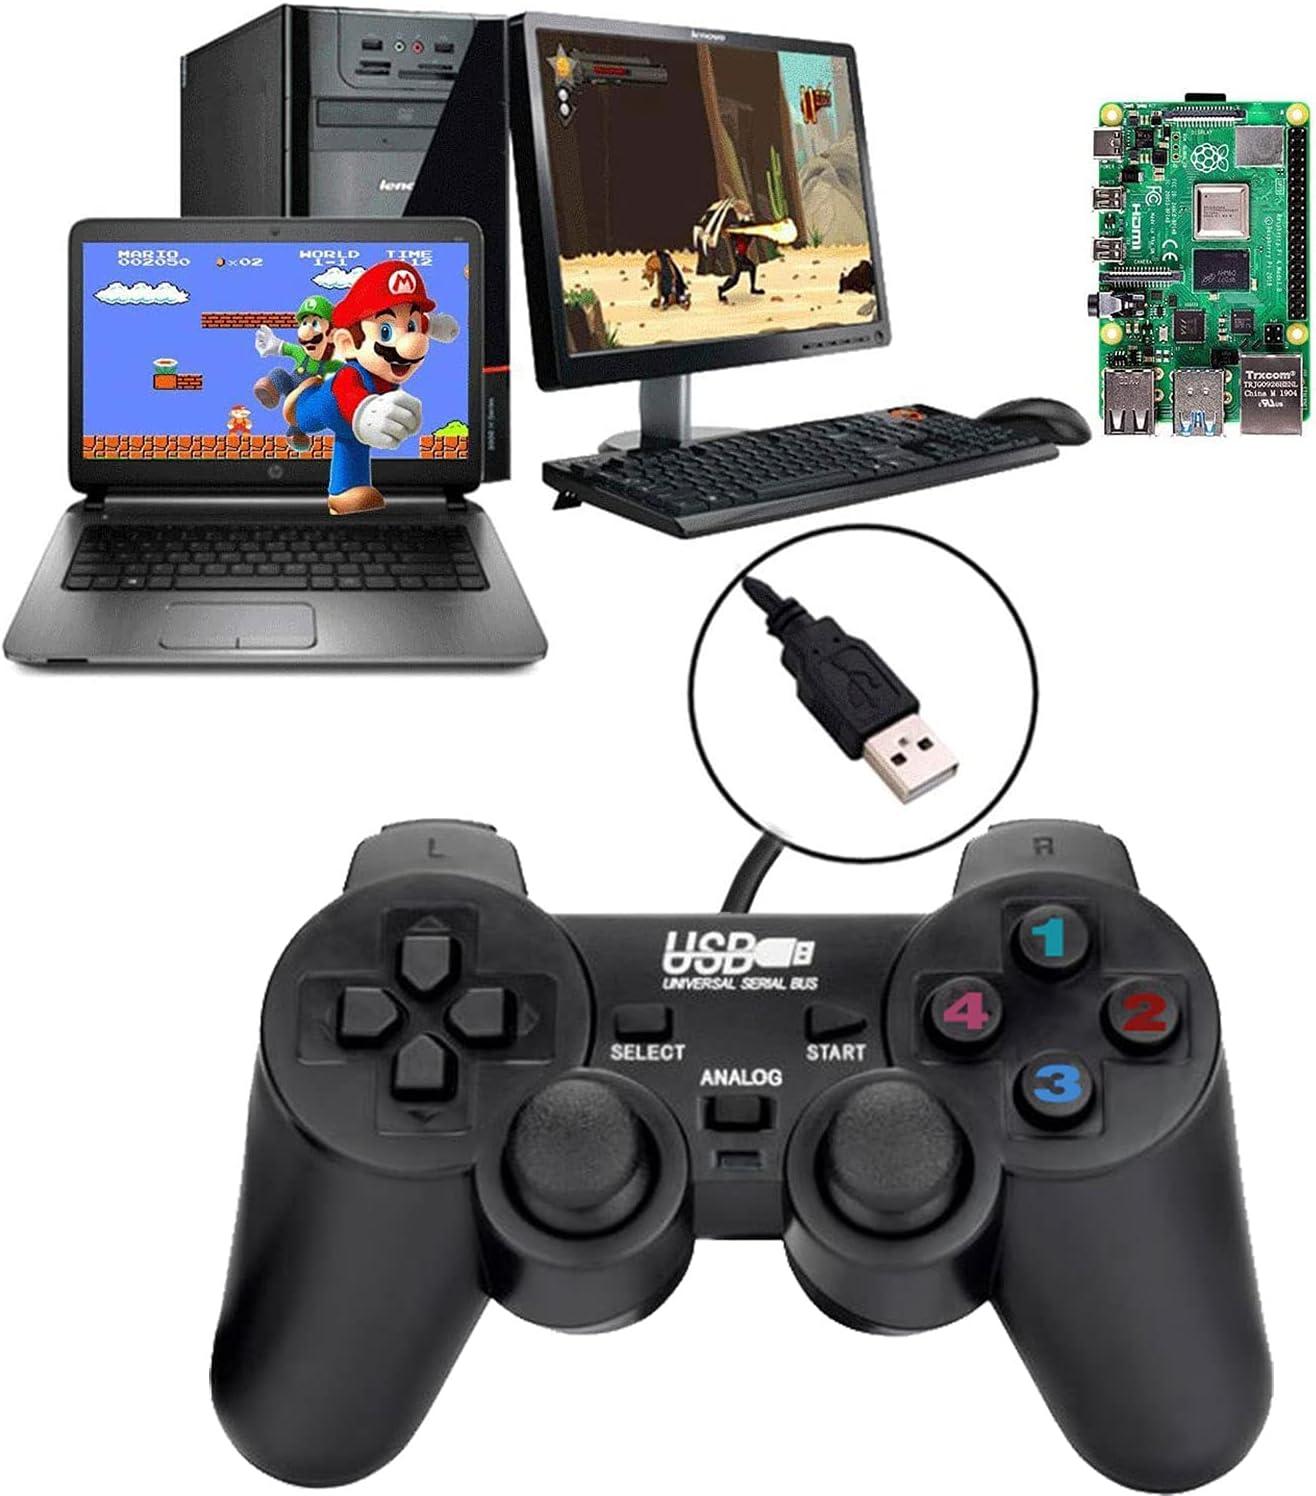 Controlador de Juego con Cable USB para Windows PC/Raspberry Pi Mando de Juegos Remoto Plug and Play Joypad Joystick de Juego de Doble Choque para Roblox/Steam/RetroPie/RecalBox